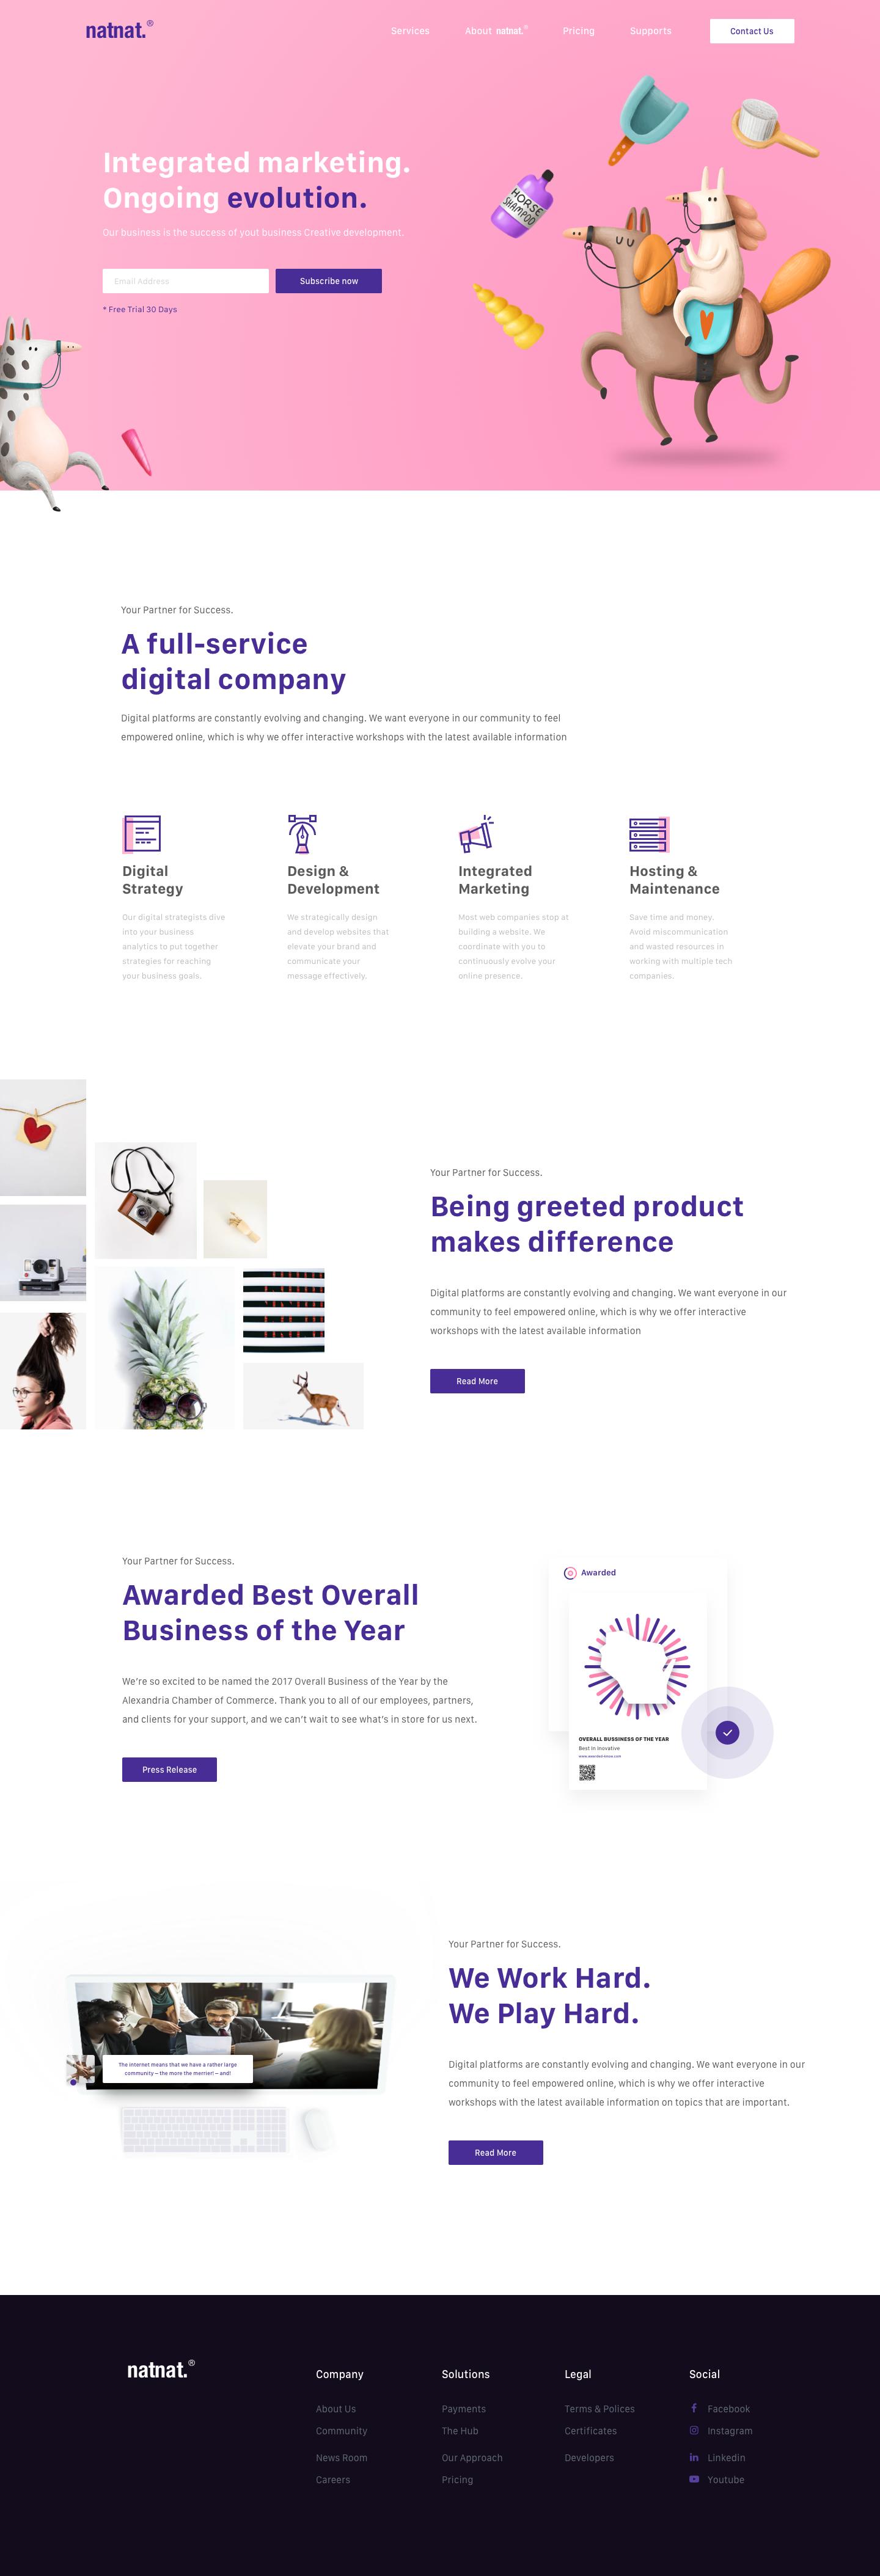 Landing Page Marketing Agency Evolution Web Design Agency Web Design Web Design Quotes